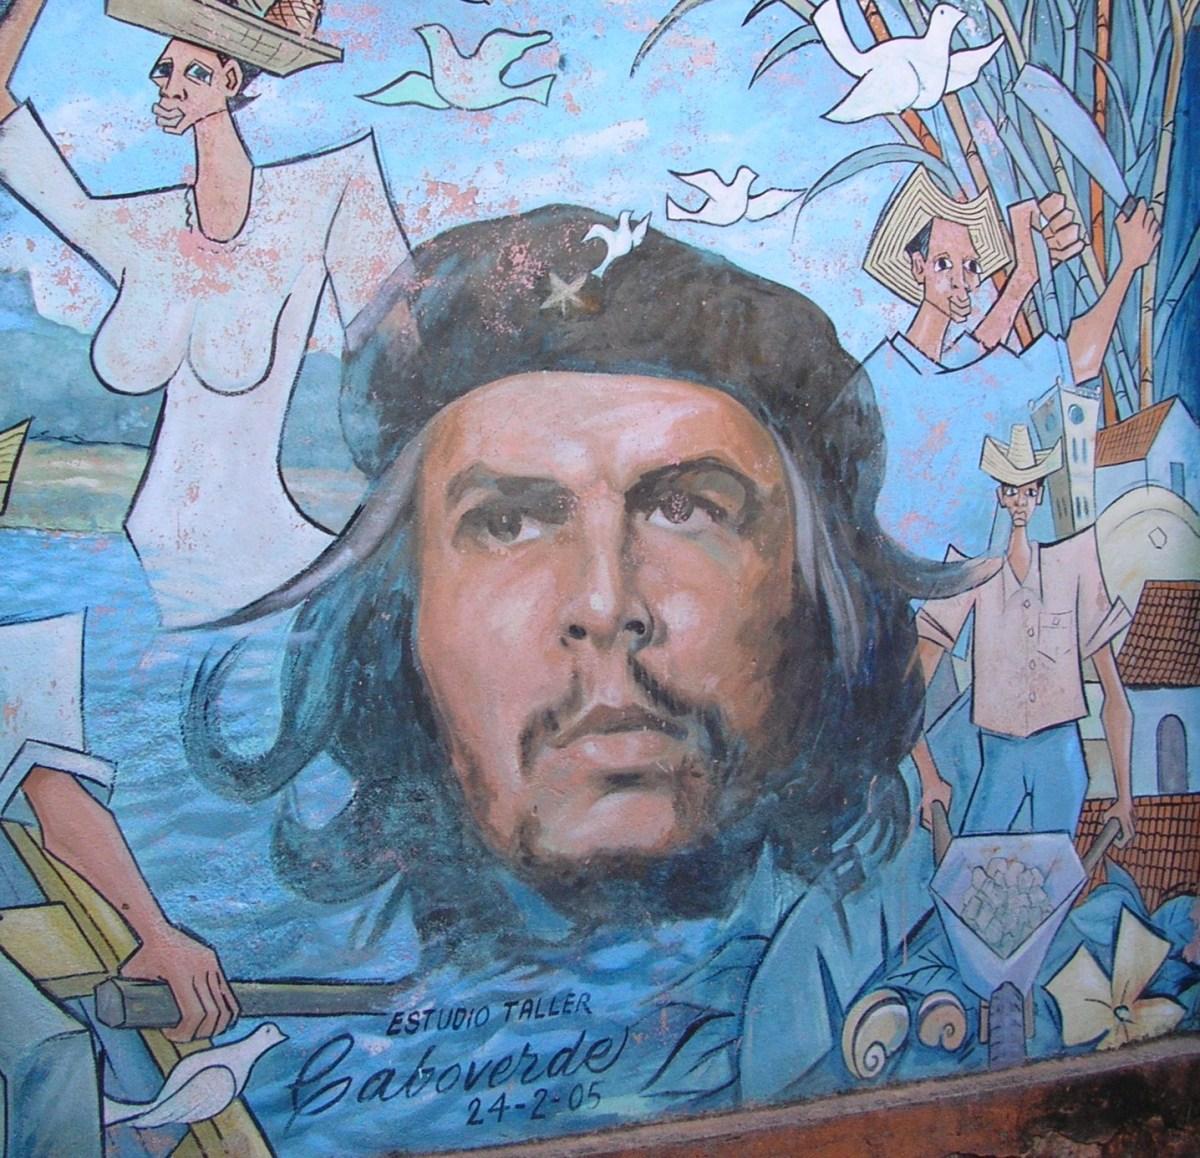 Cuba…Tweet-Up?